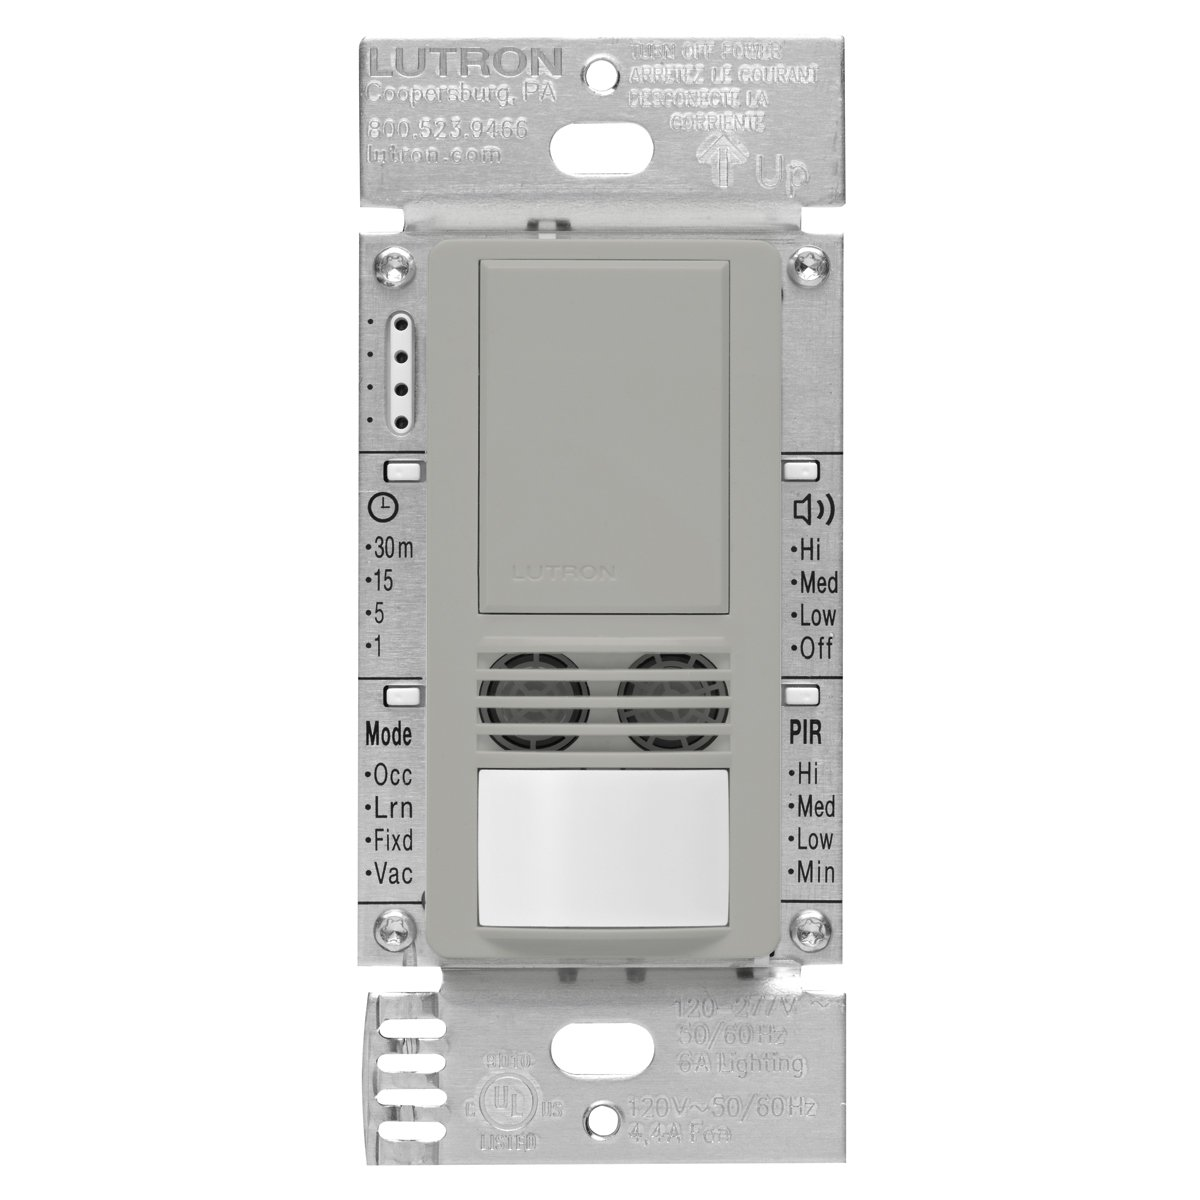 Lutron Maestro Dual Tech Occupancy Sensor Switch, neutral required, 6 Amp 3-Way/Multi-Location, MS-B102-GR, Gray